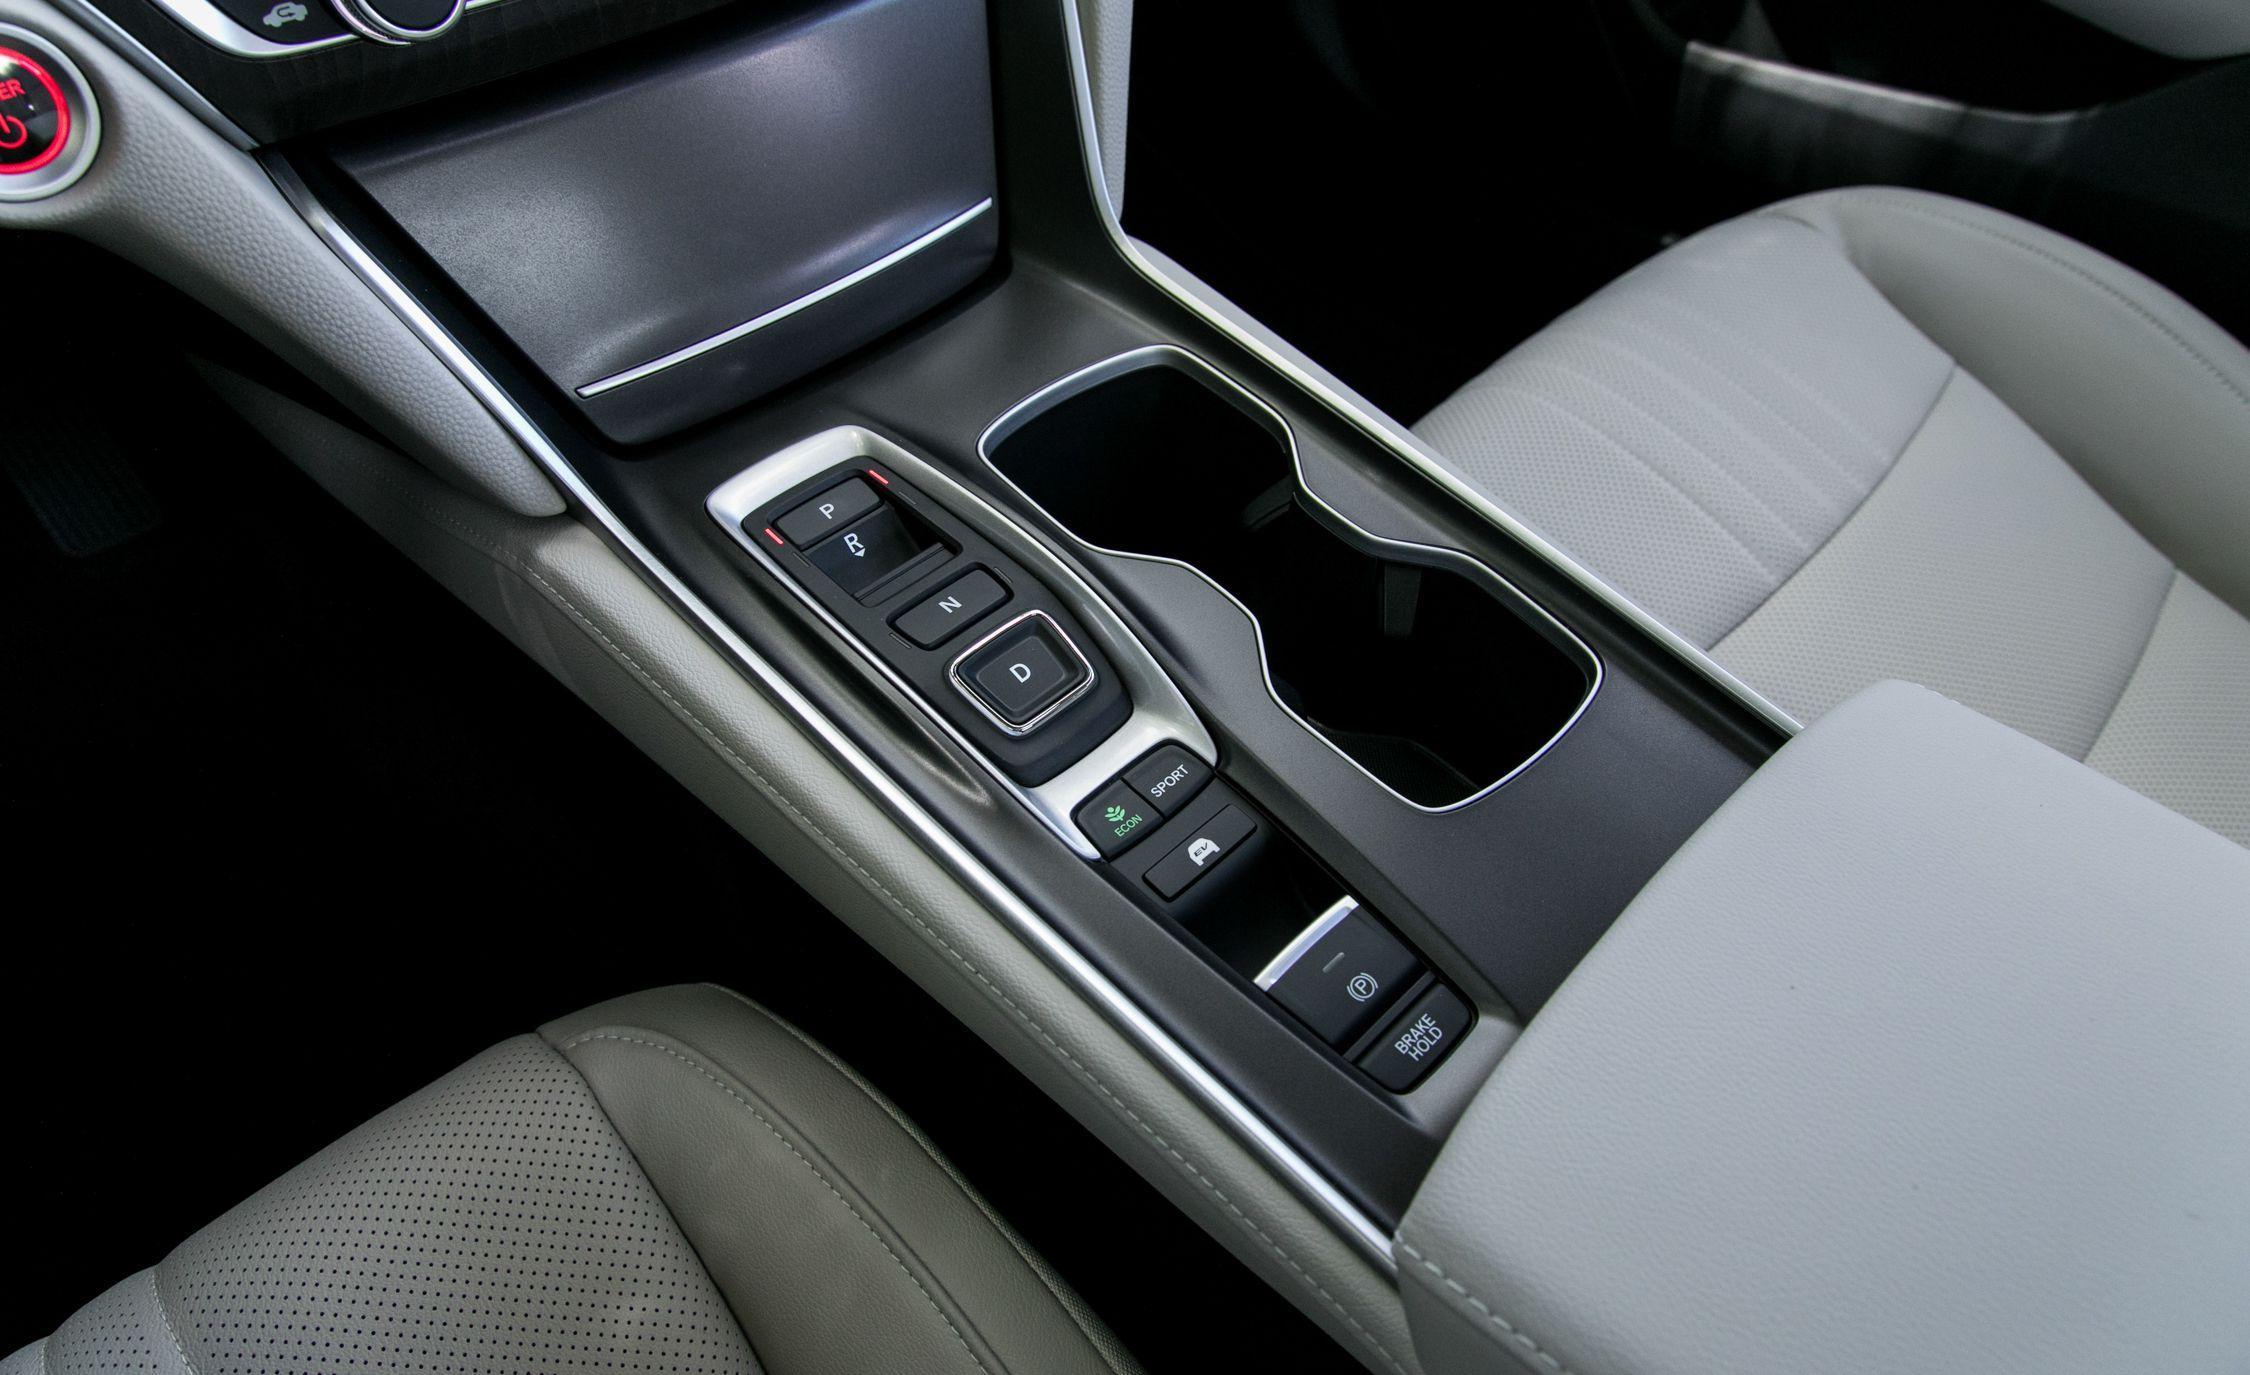 2018 Honda Accord Hybrid Interior Seats Wallpapers (13)